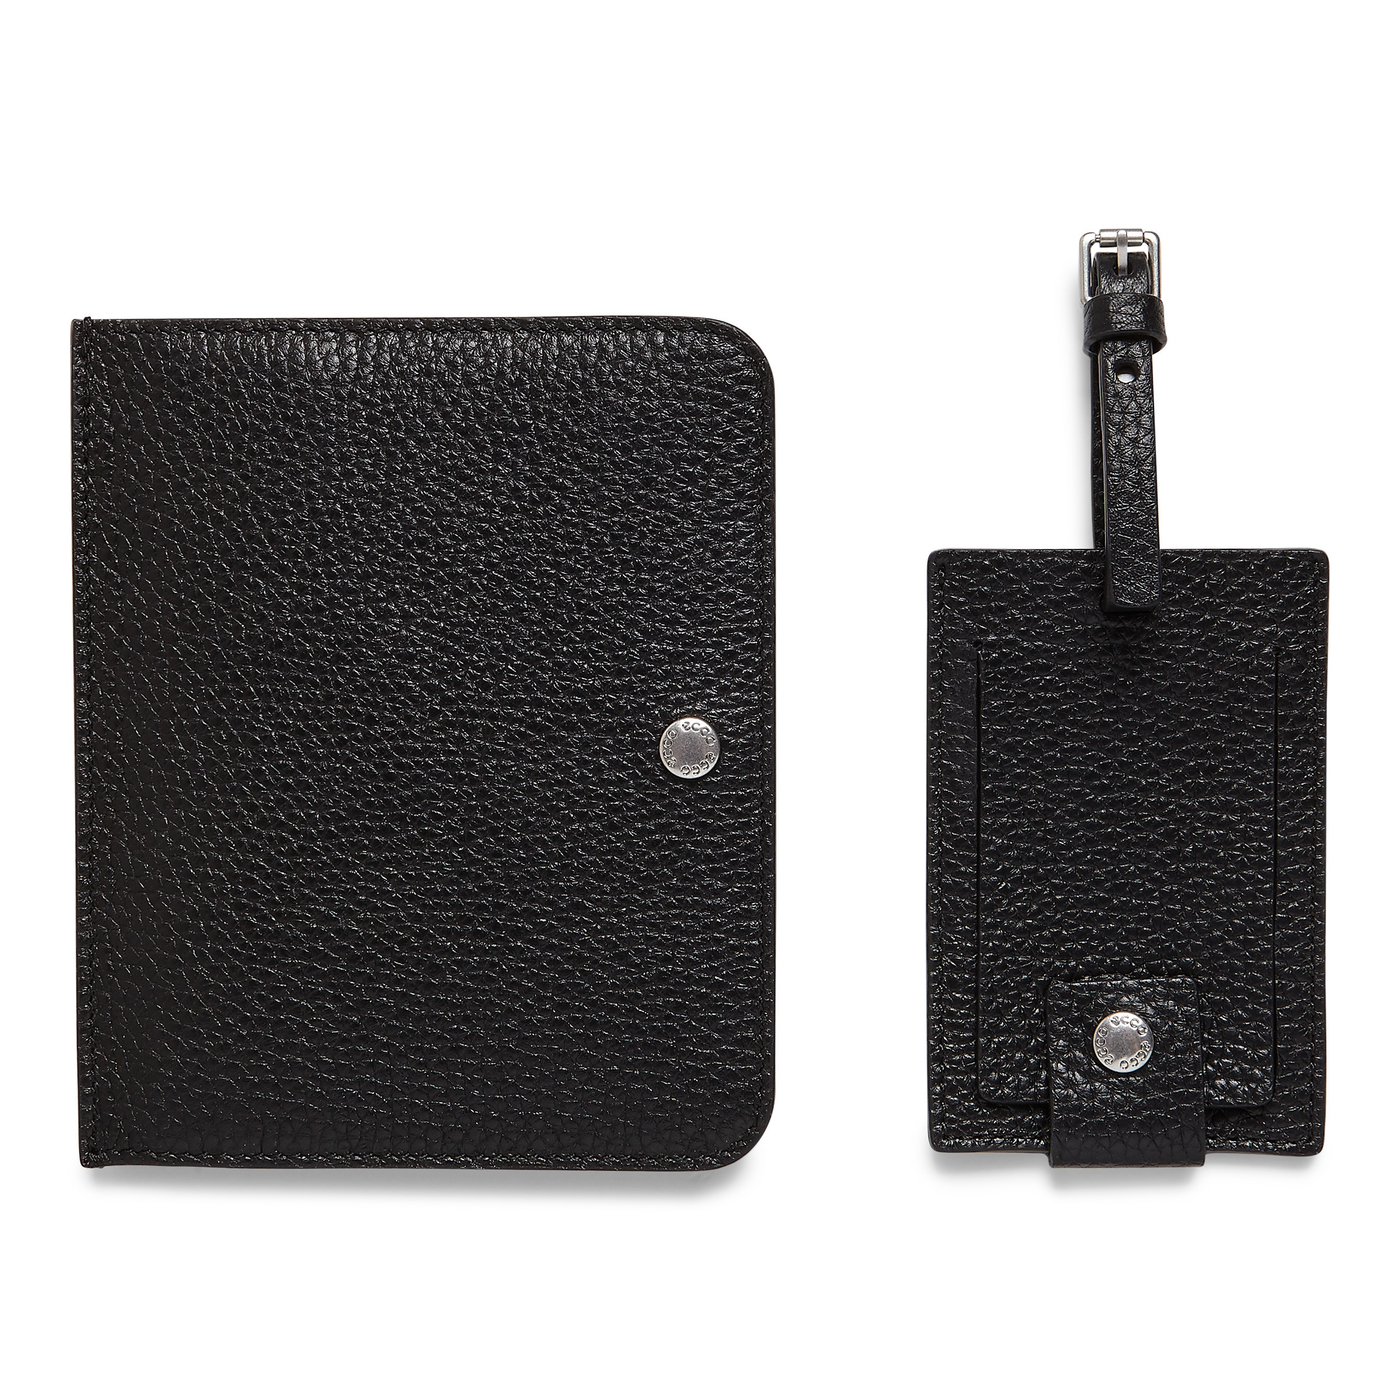 ECCO SP 3 Travel Gift Box